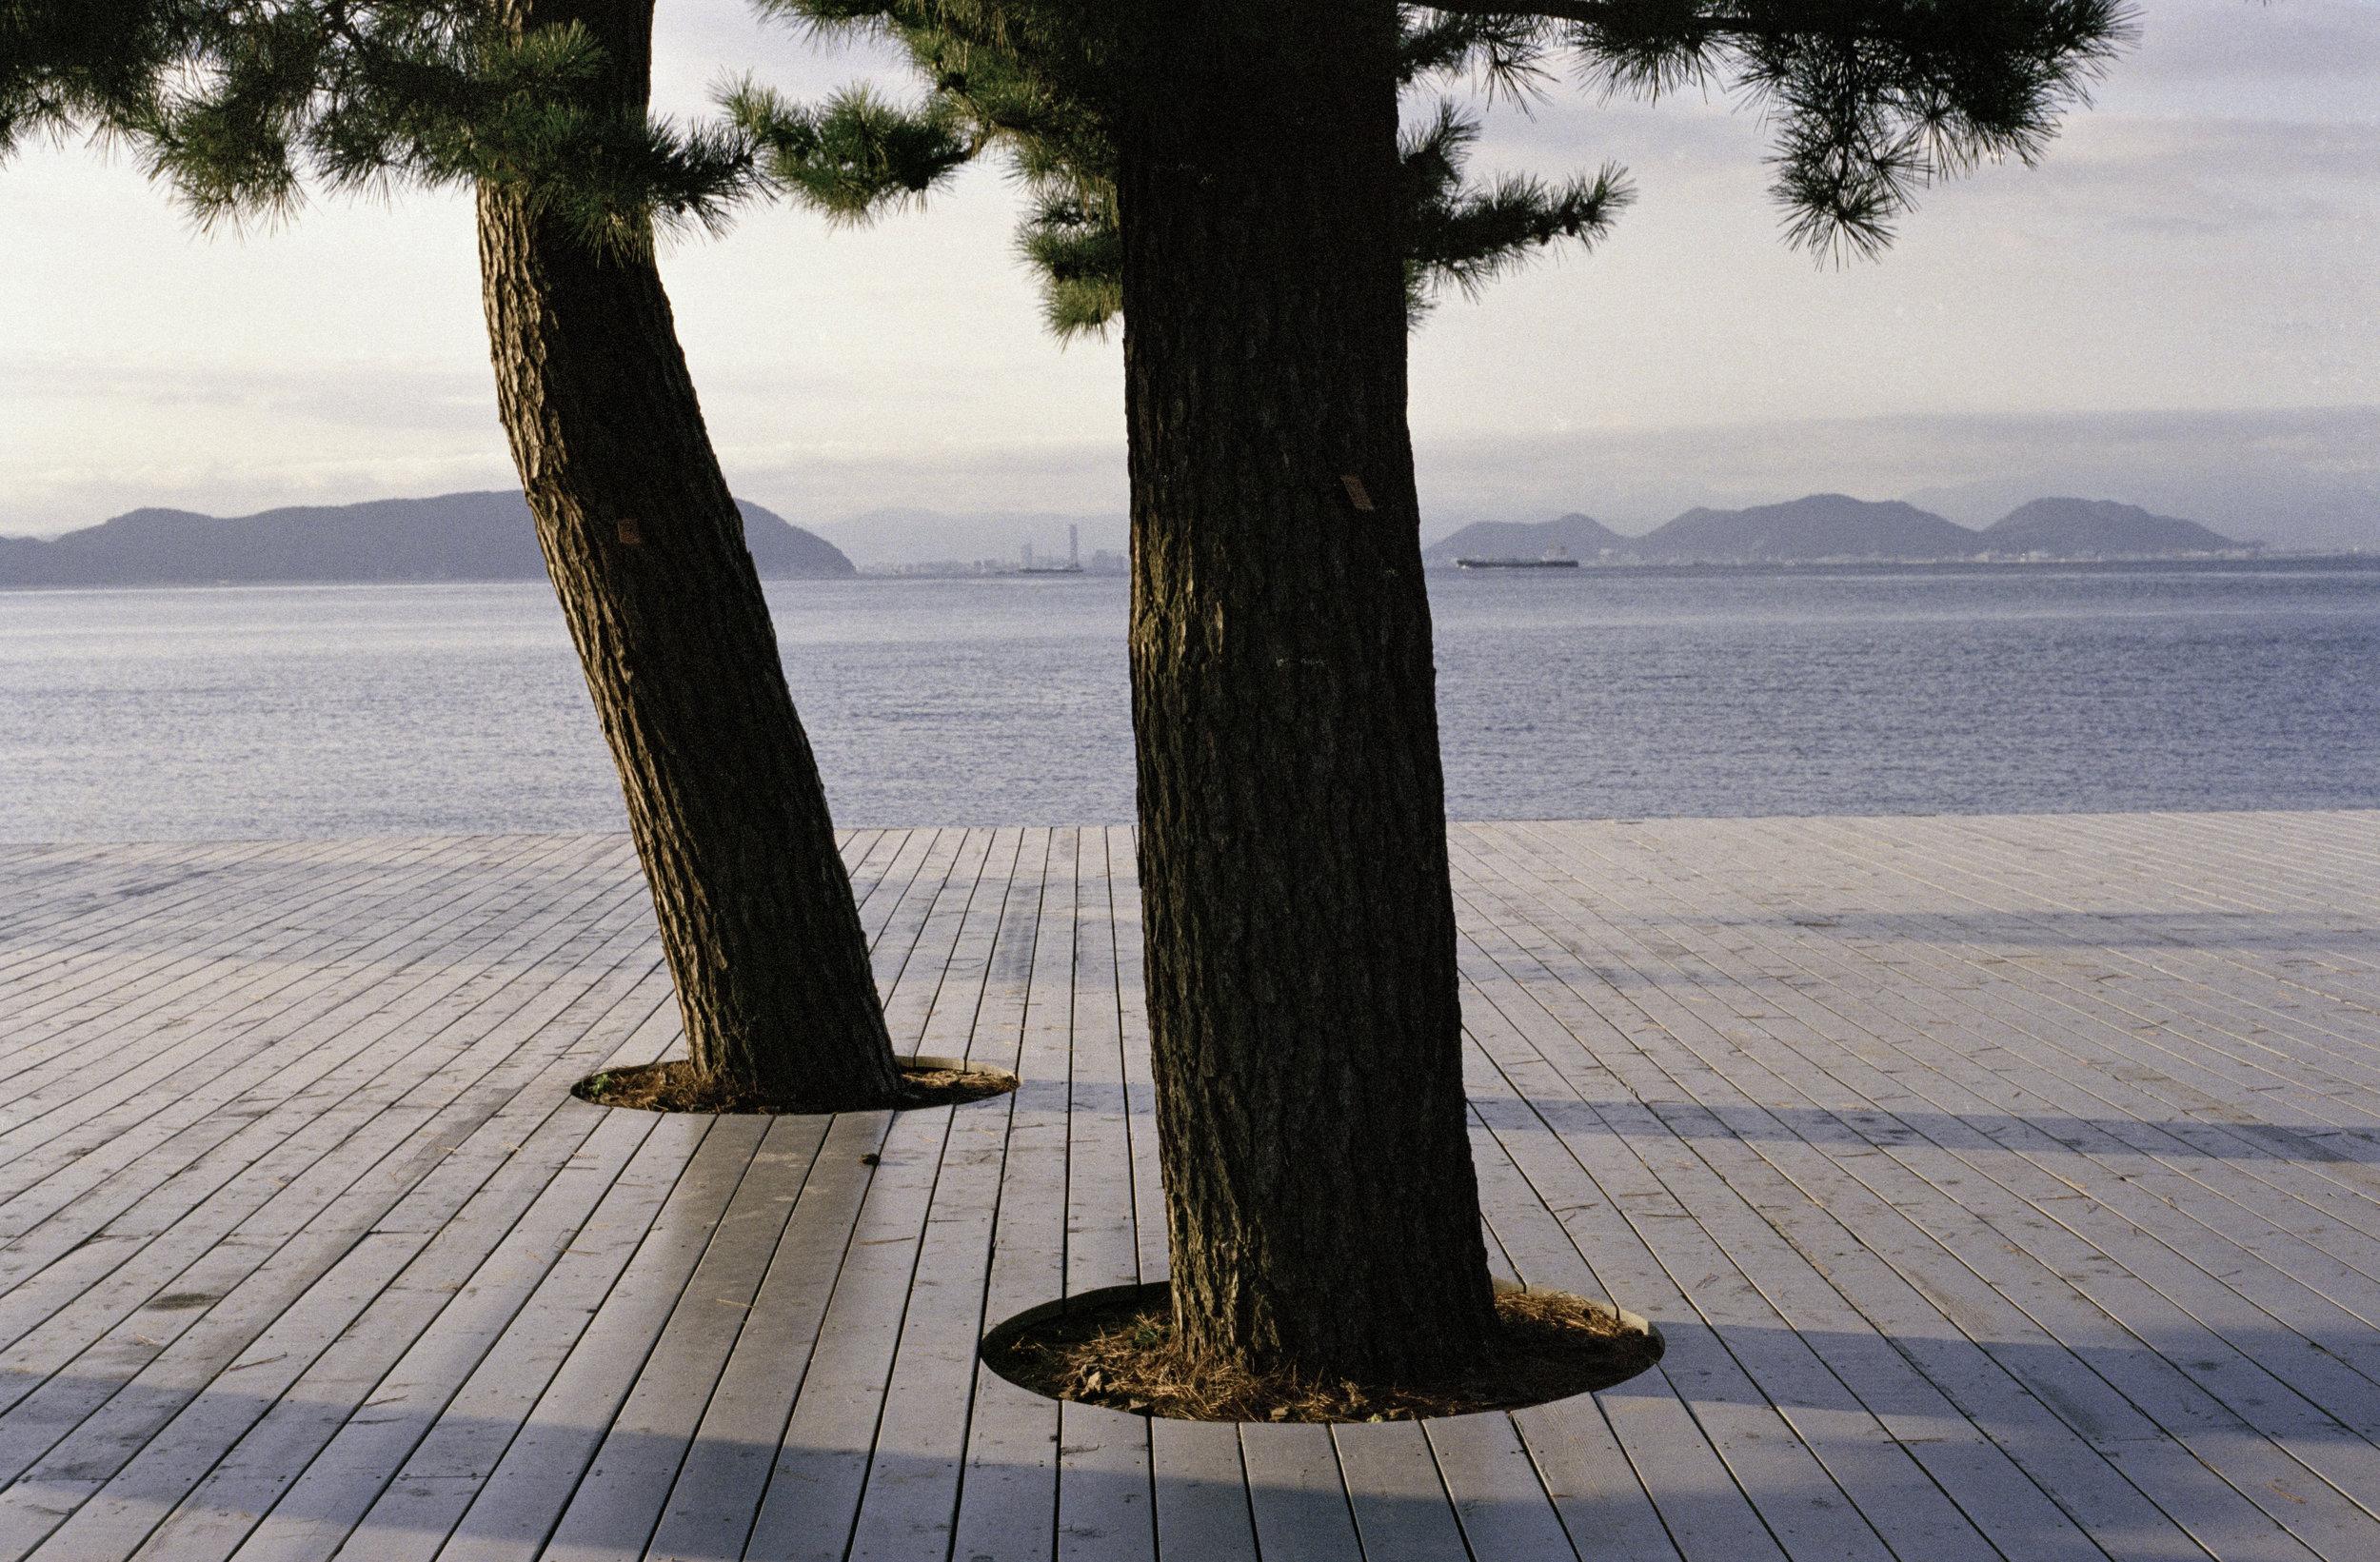 trees_final.jpg